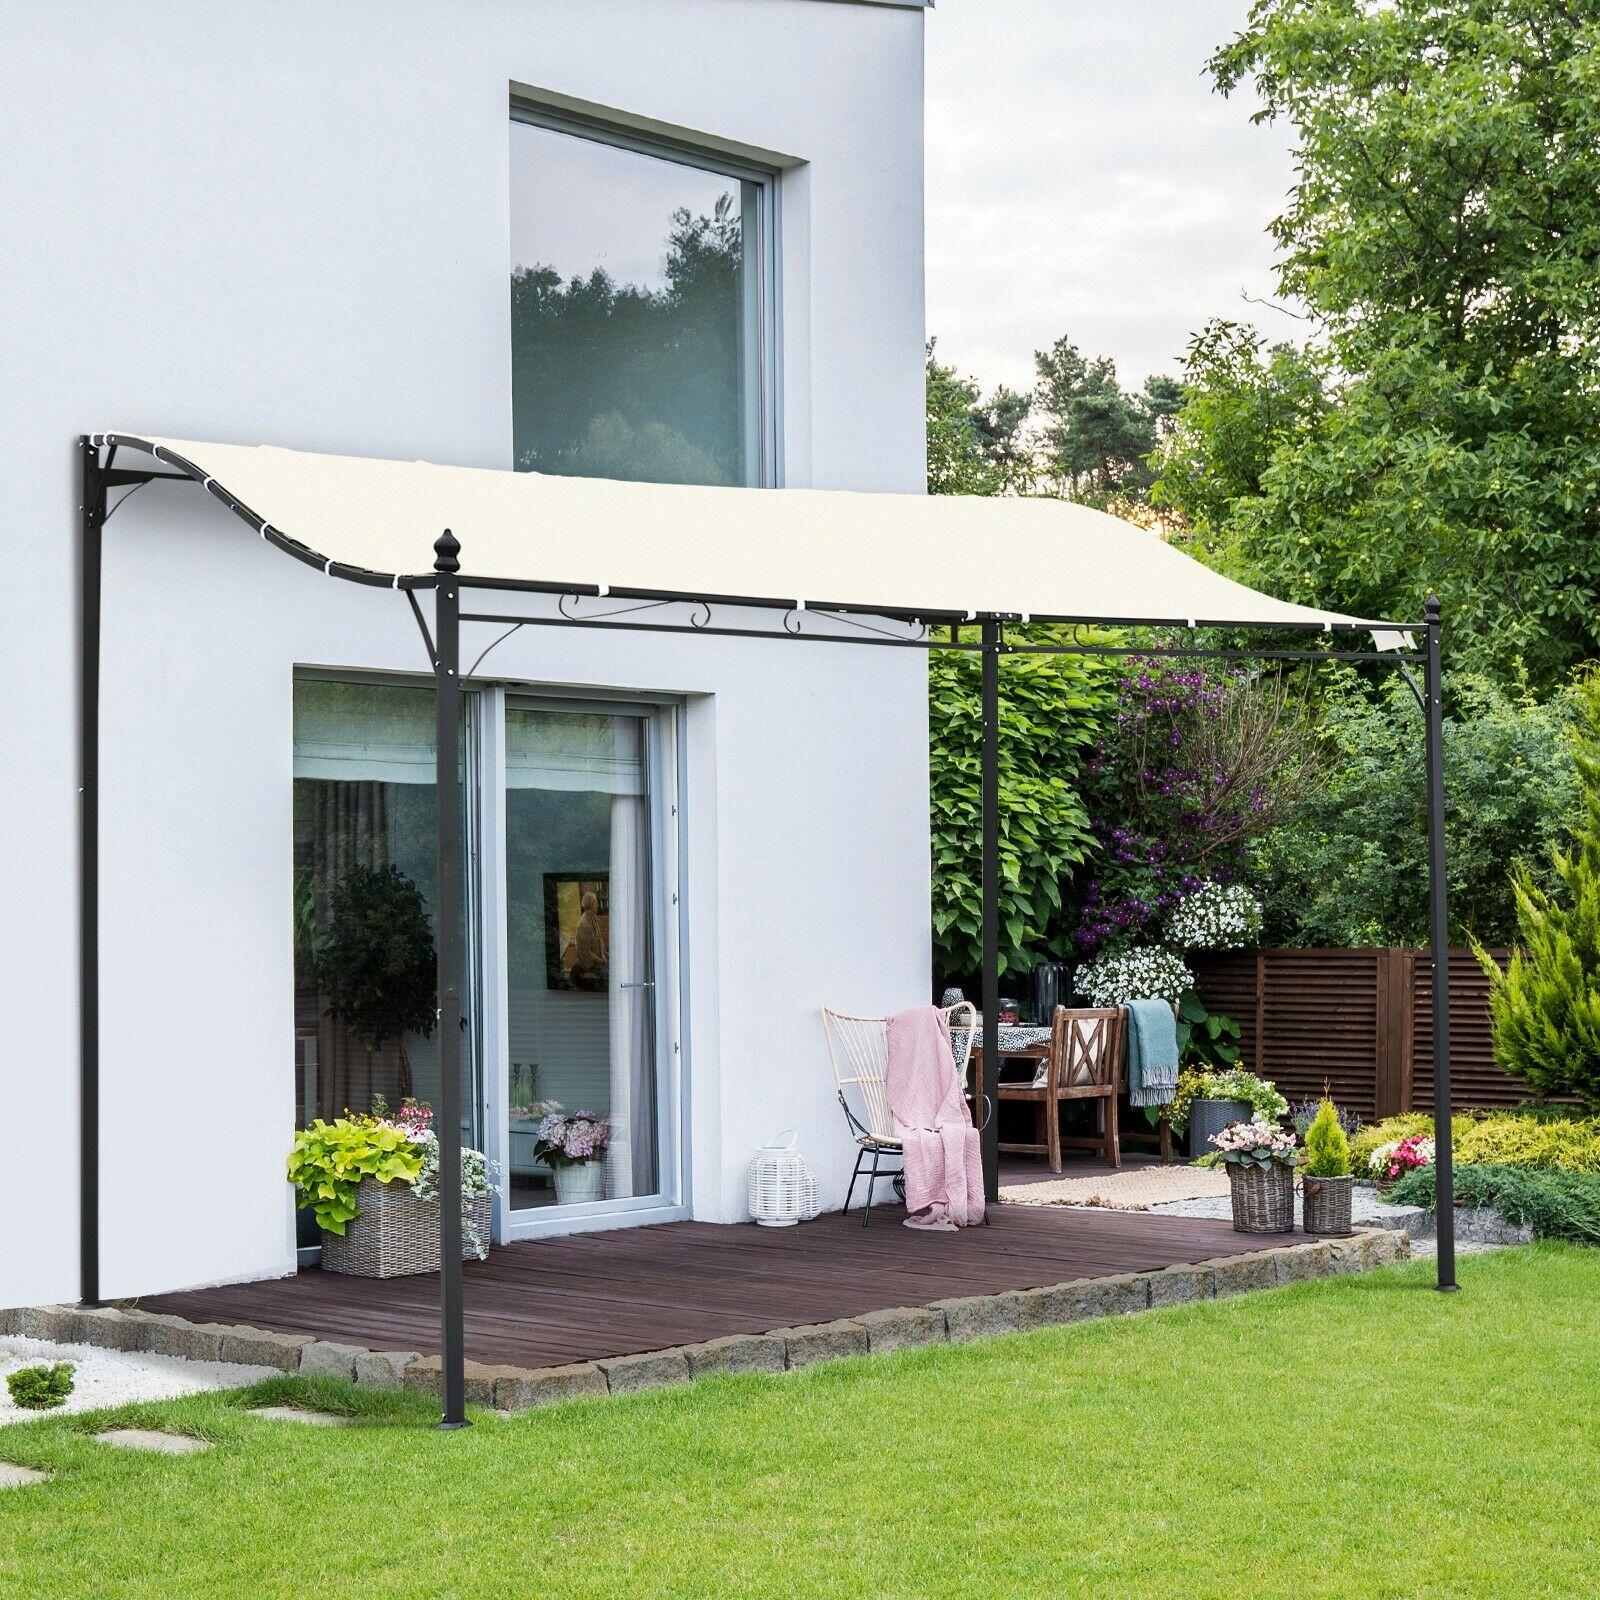 3 x 3 m Canopy Metal Wall Gazebo Awning Garden Marquee Shelter Door Porch in Cream £136.79 (UK Mainland) @ eBay 2011homcom